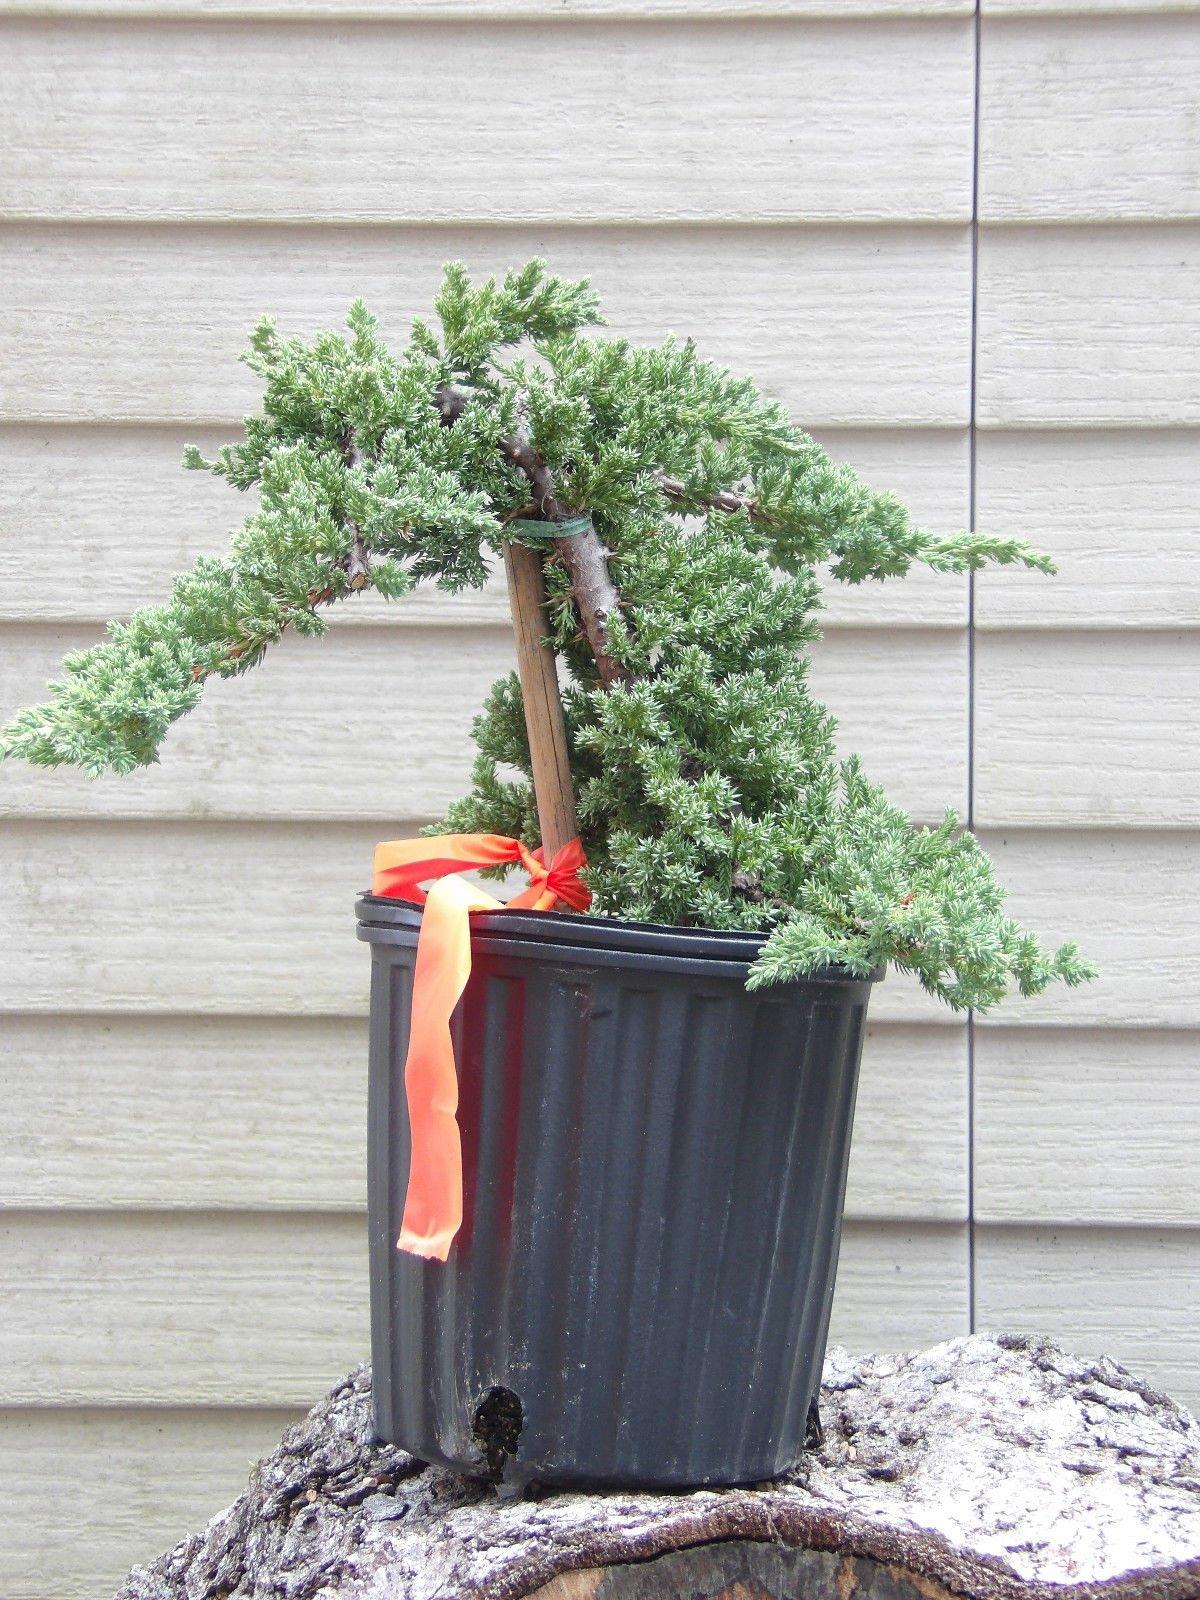 12 Bonsai Tree Plant Pre Bonsai Juniper Bonsai Tree